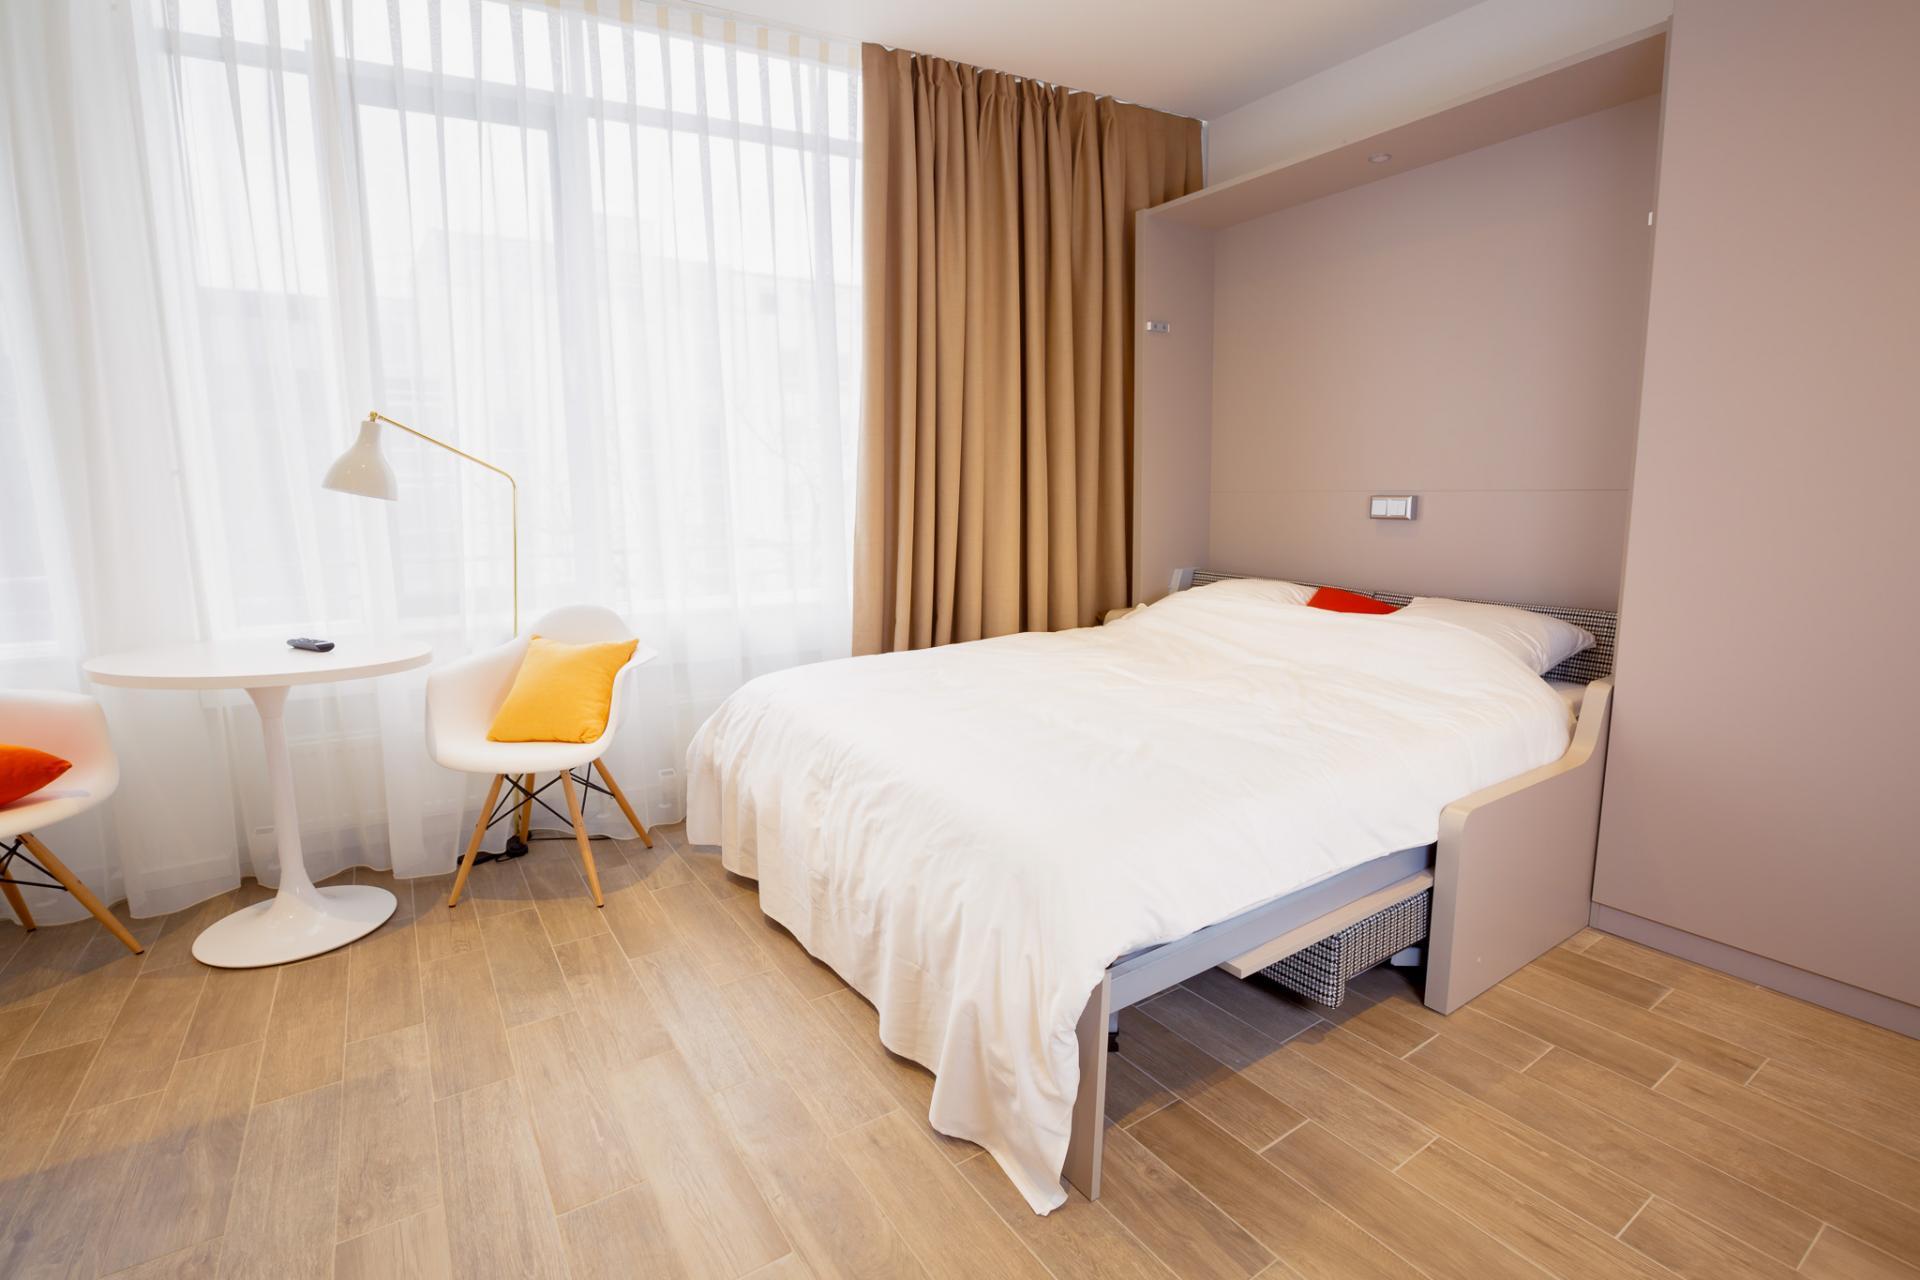 Sofa bed at Brera Westendstrasse 170 Apartments - Citybase Apartments